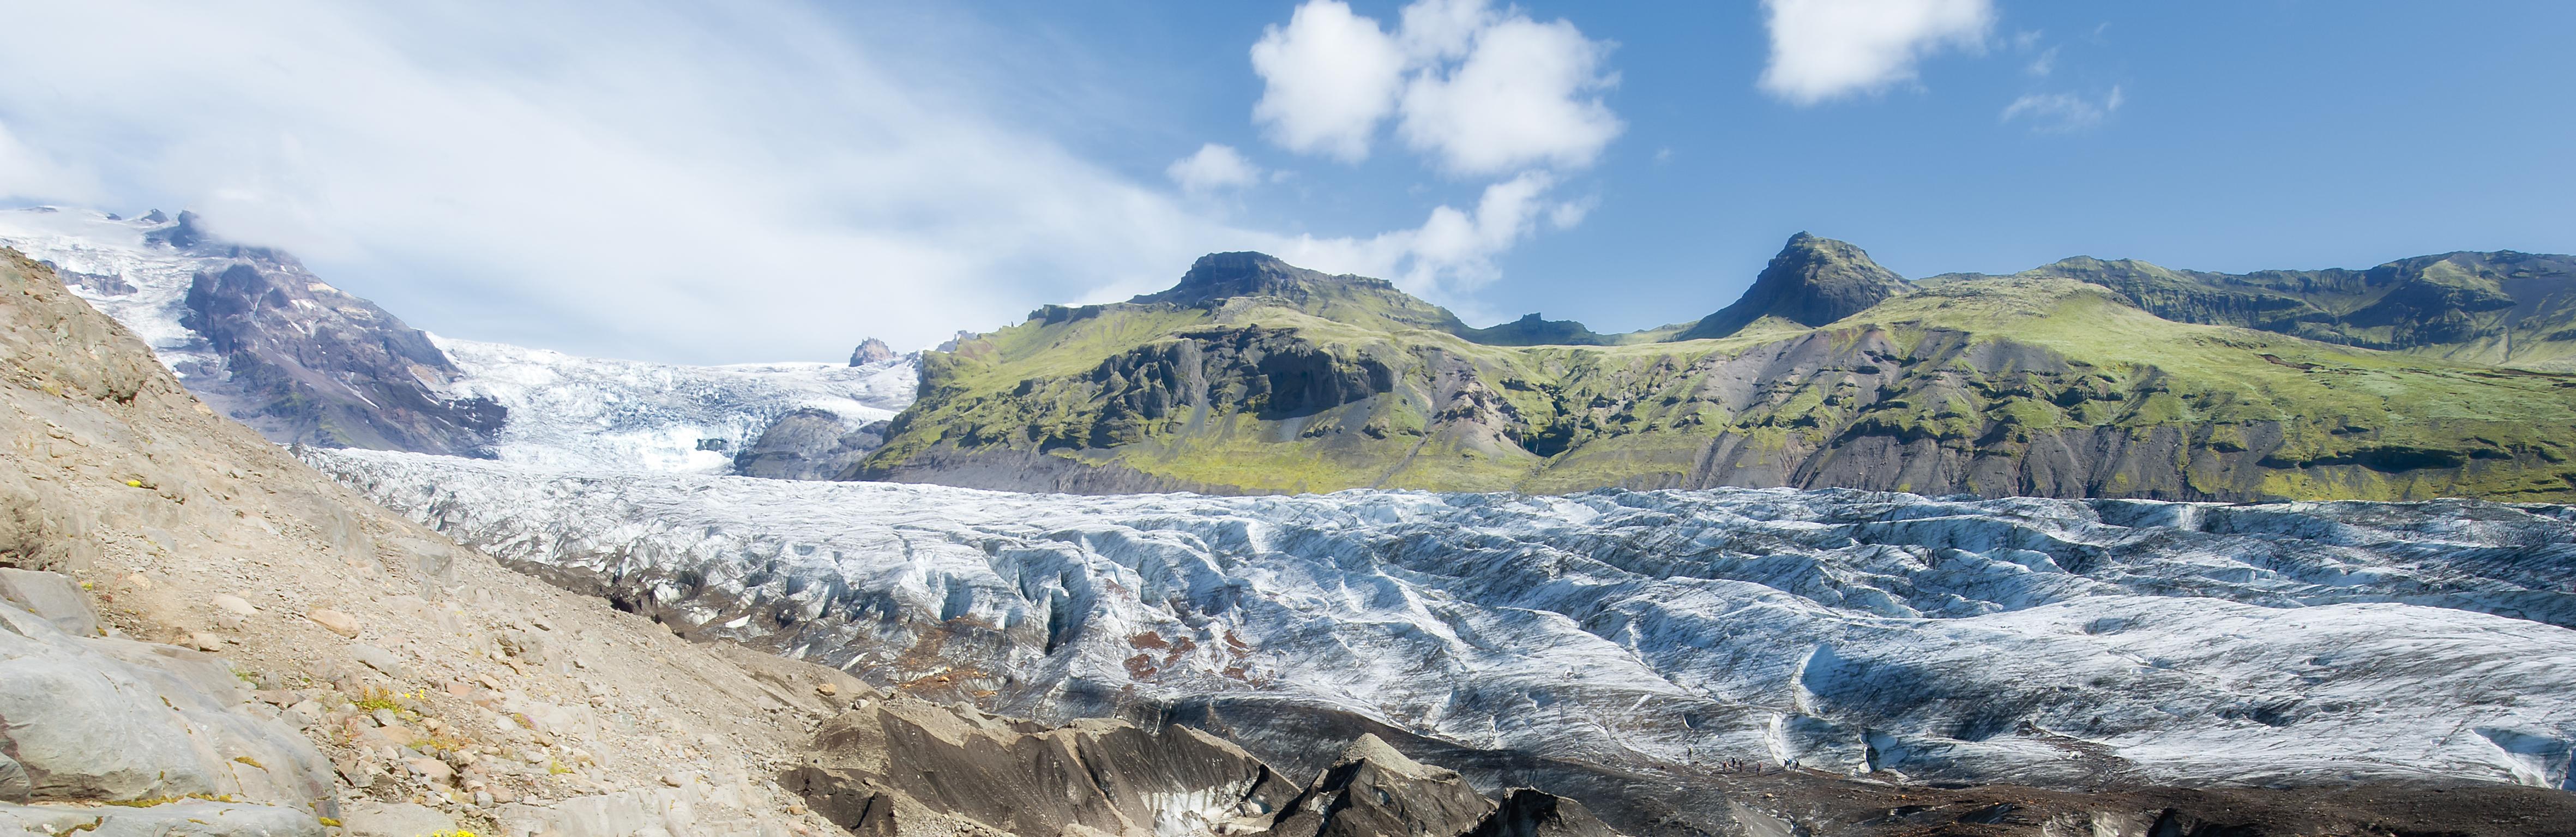 Svínafellsjökull Gletscher